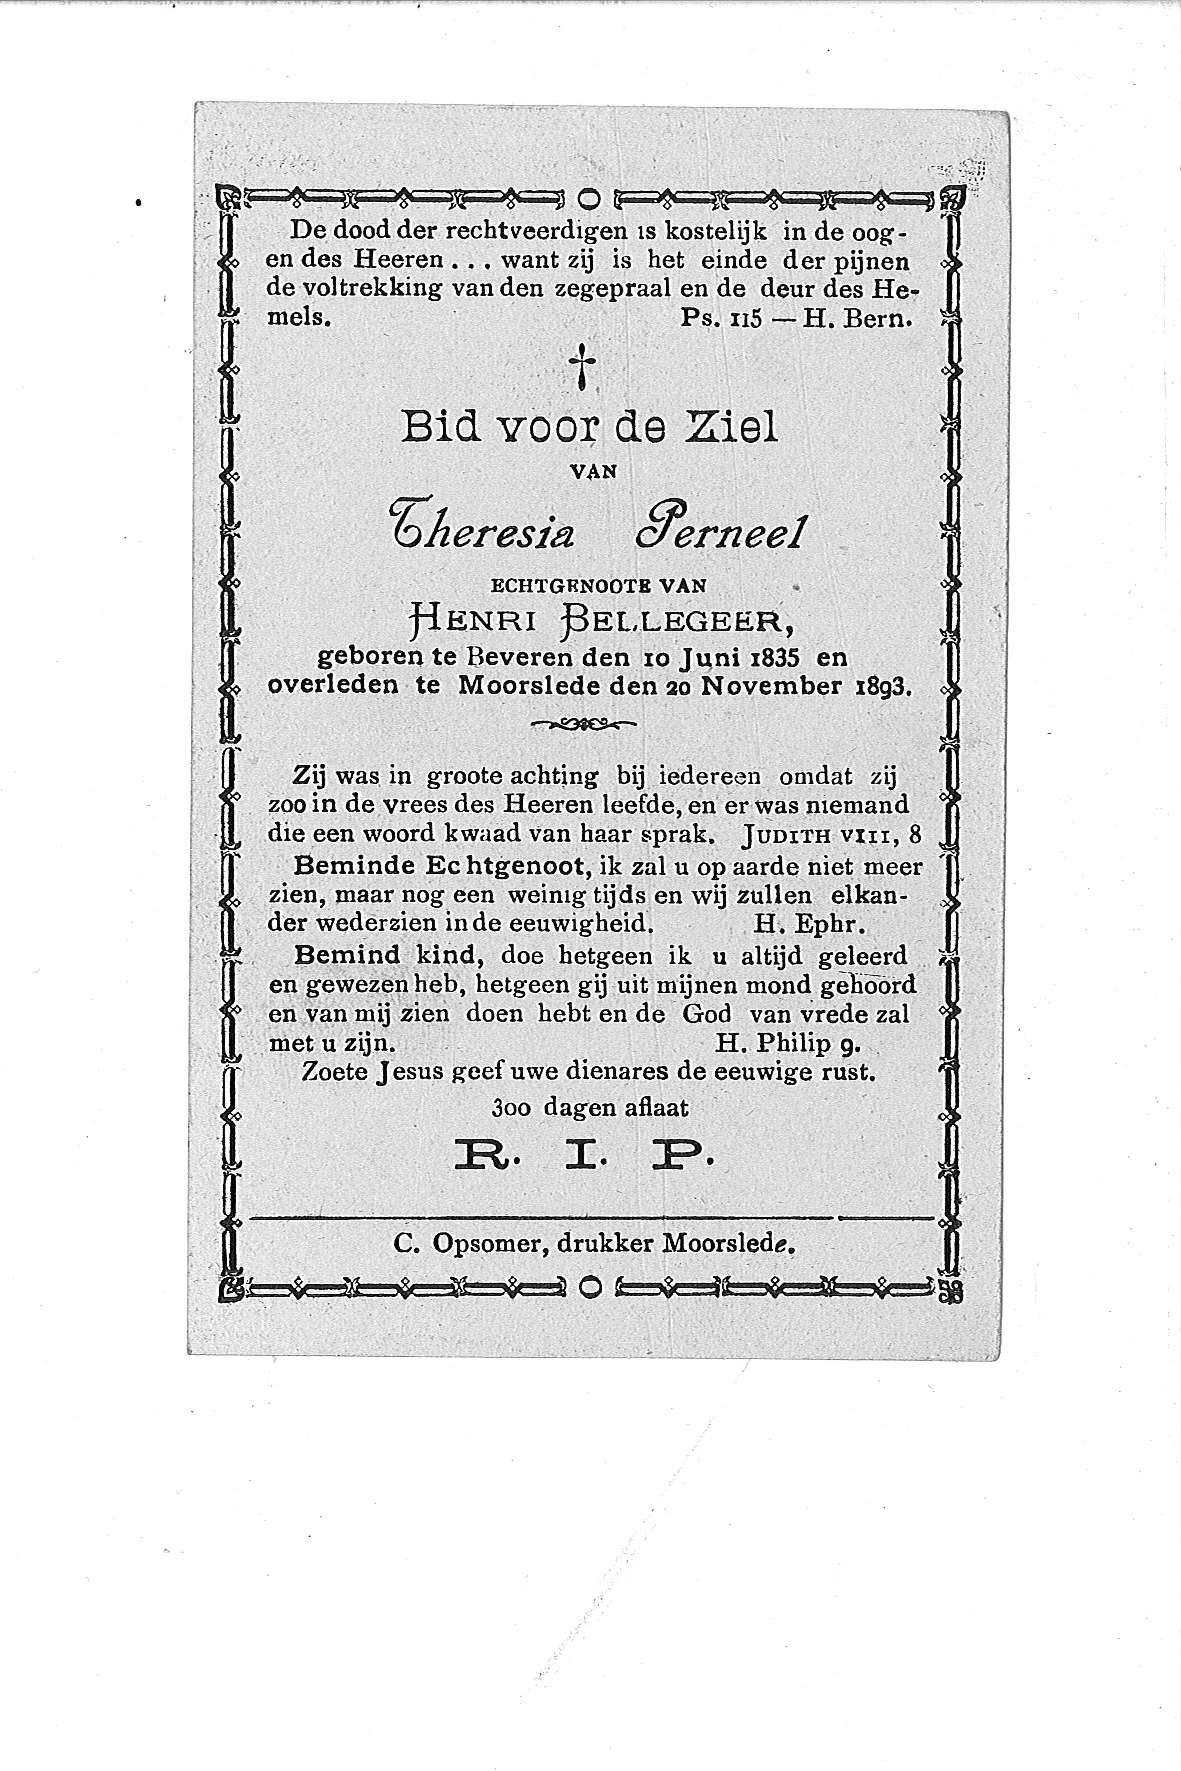 Theresiaa(1893)20100407141842_00034.jpg